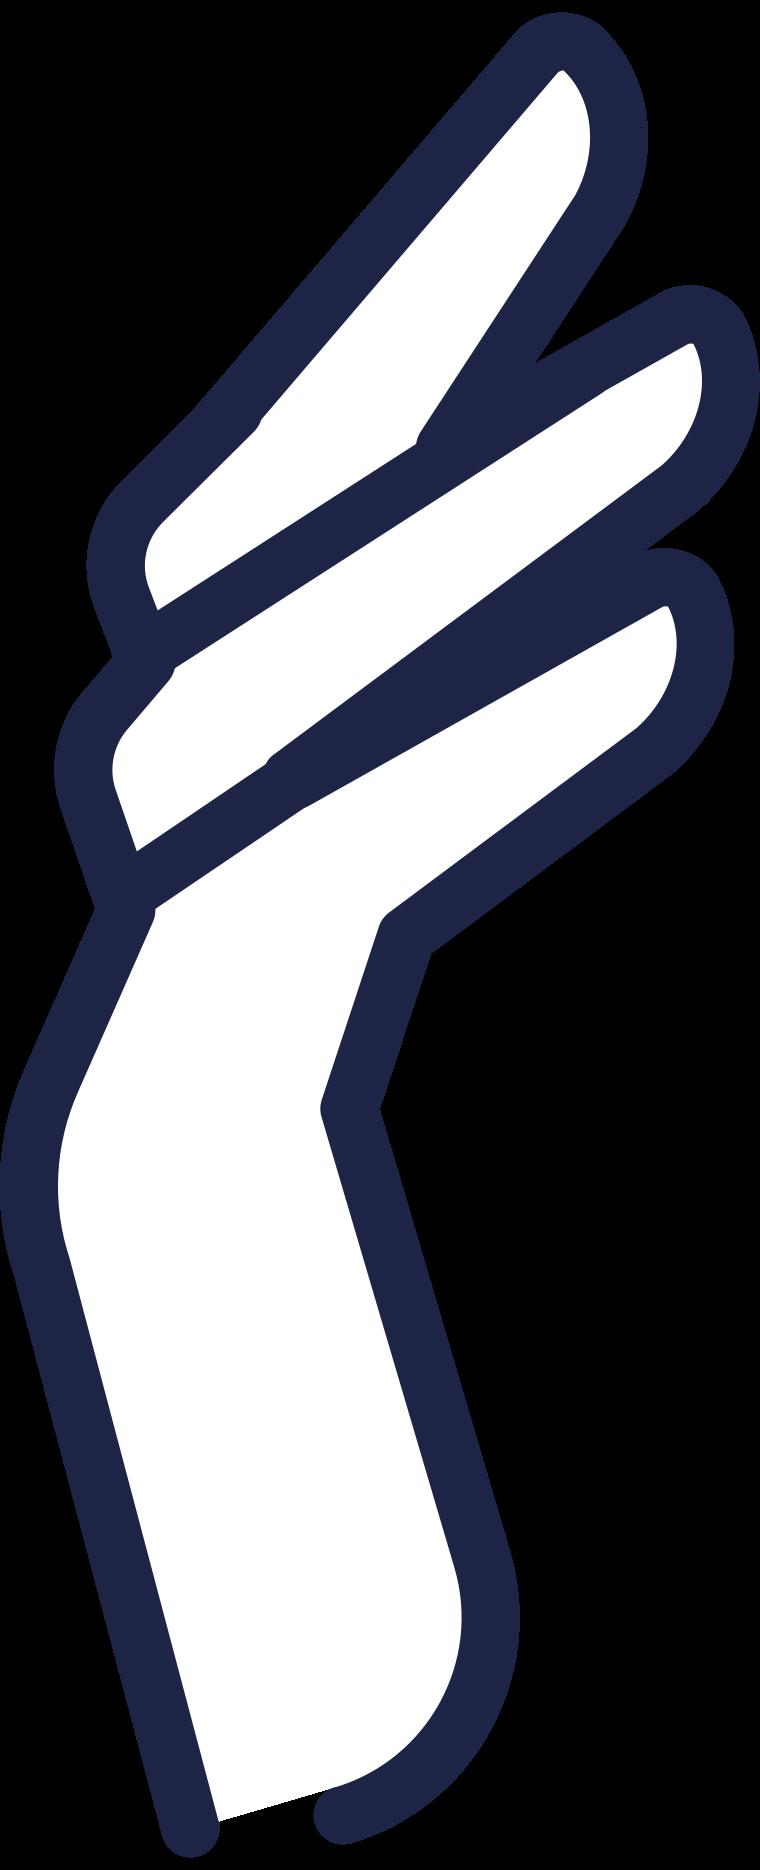 fingers holding 2 line Clipart illustration in PNG, SVG